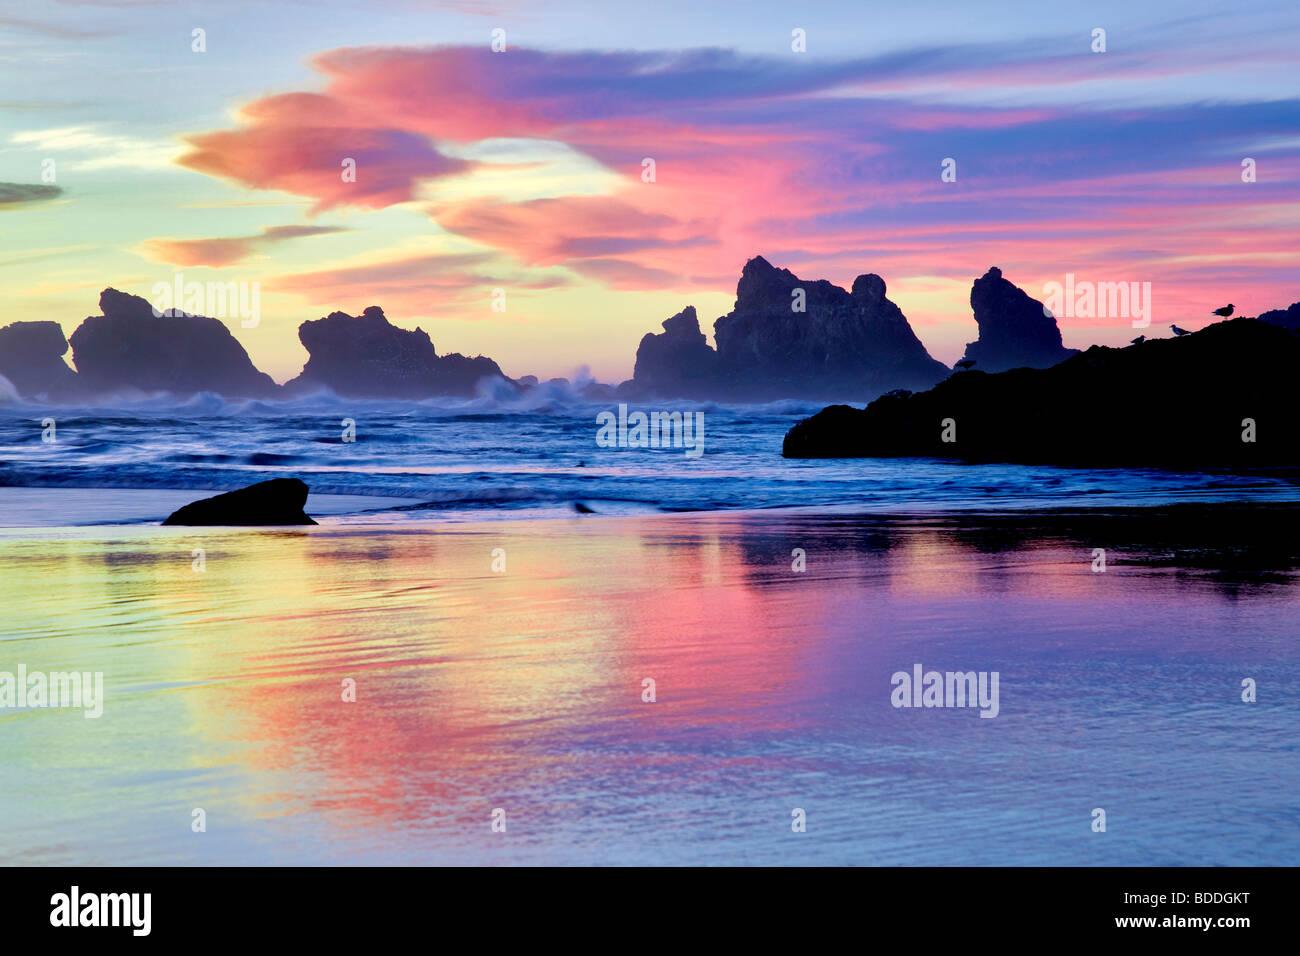 Low tide and sunset reflection at Bandon, Oregon - Stock Image